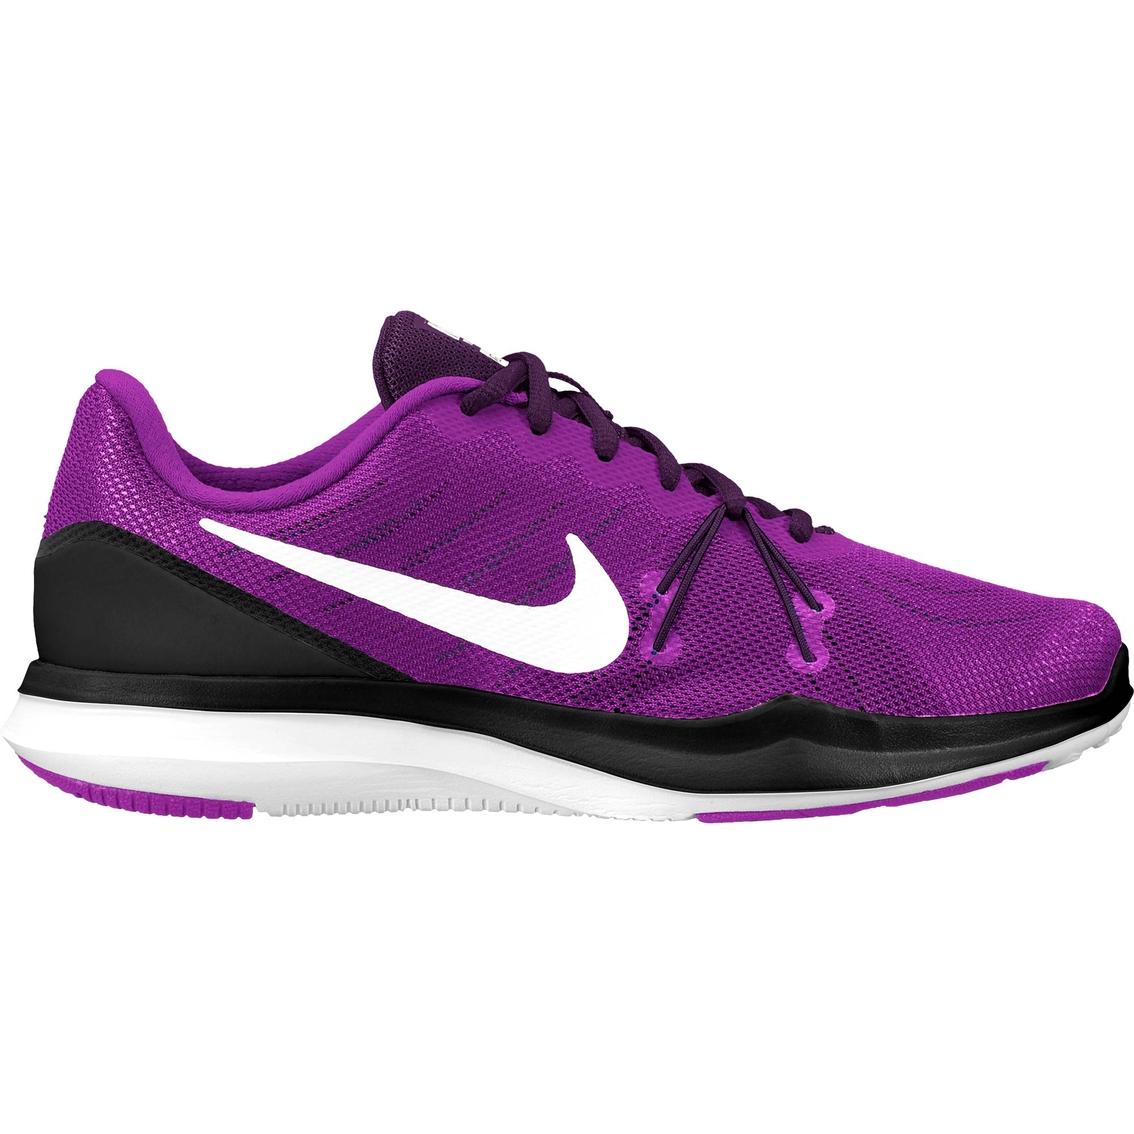 a37187b603600f Nike Women s In-season Tr 7 Training Shoes